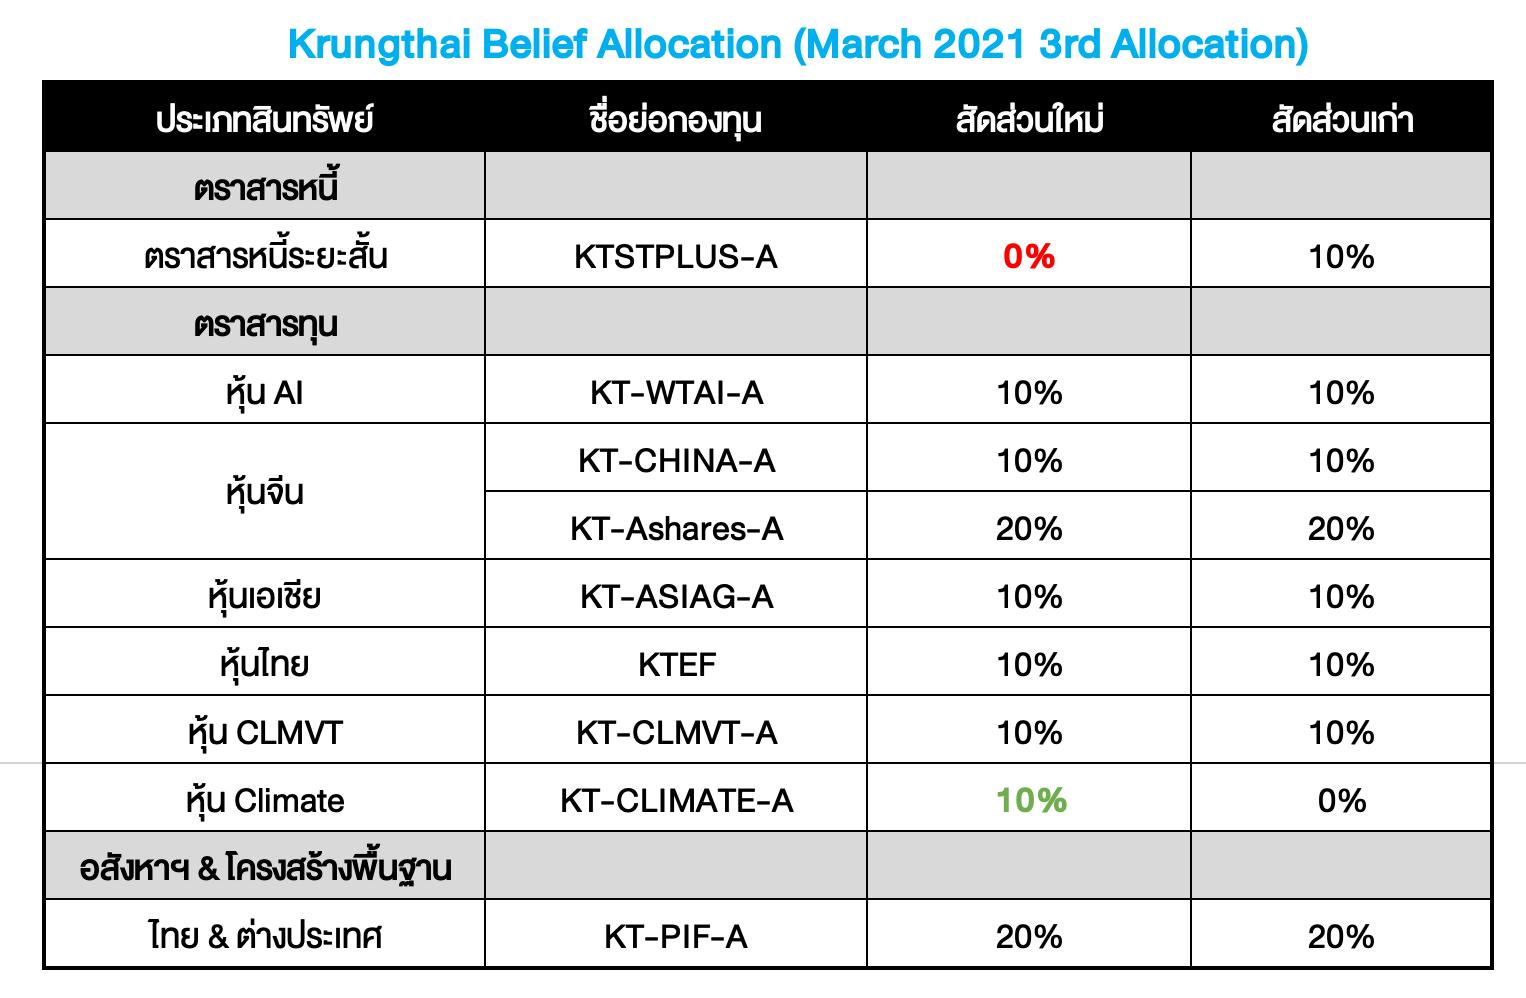 Krungthai Belief Allocation ปรับพอร์ตเดือน มี.ค. 2021 (ครั้งที่ 3) : Climate: The New Defensive